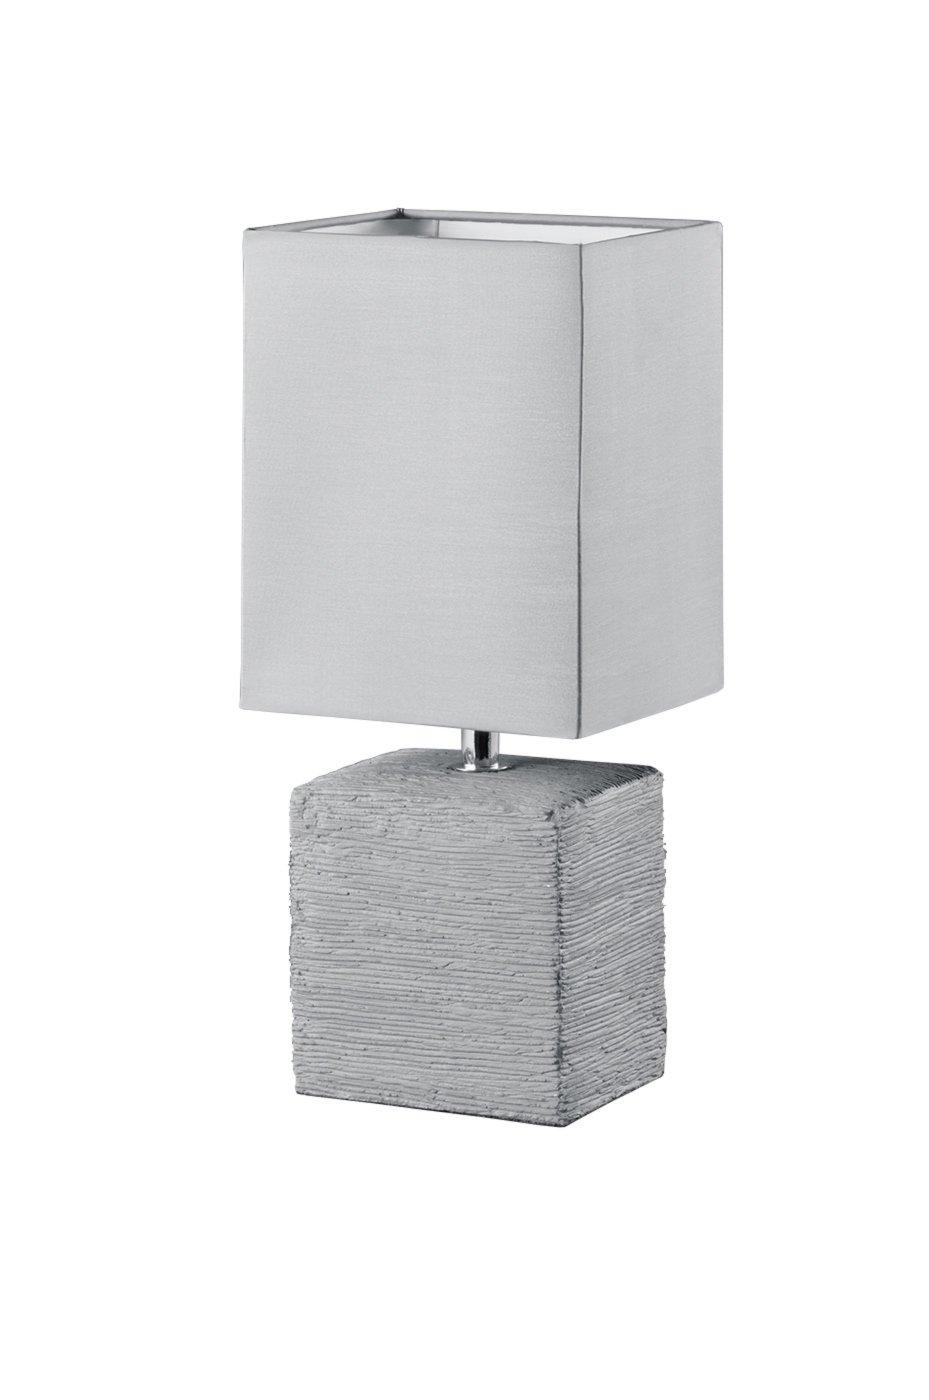 tischlampe ping titan grau keramik 1 flammig. Black Bedroom Furniture Sets. Home Design Ideas